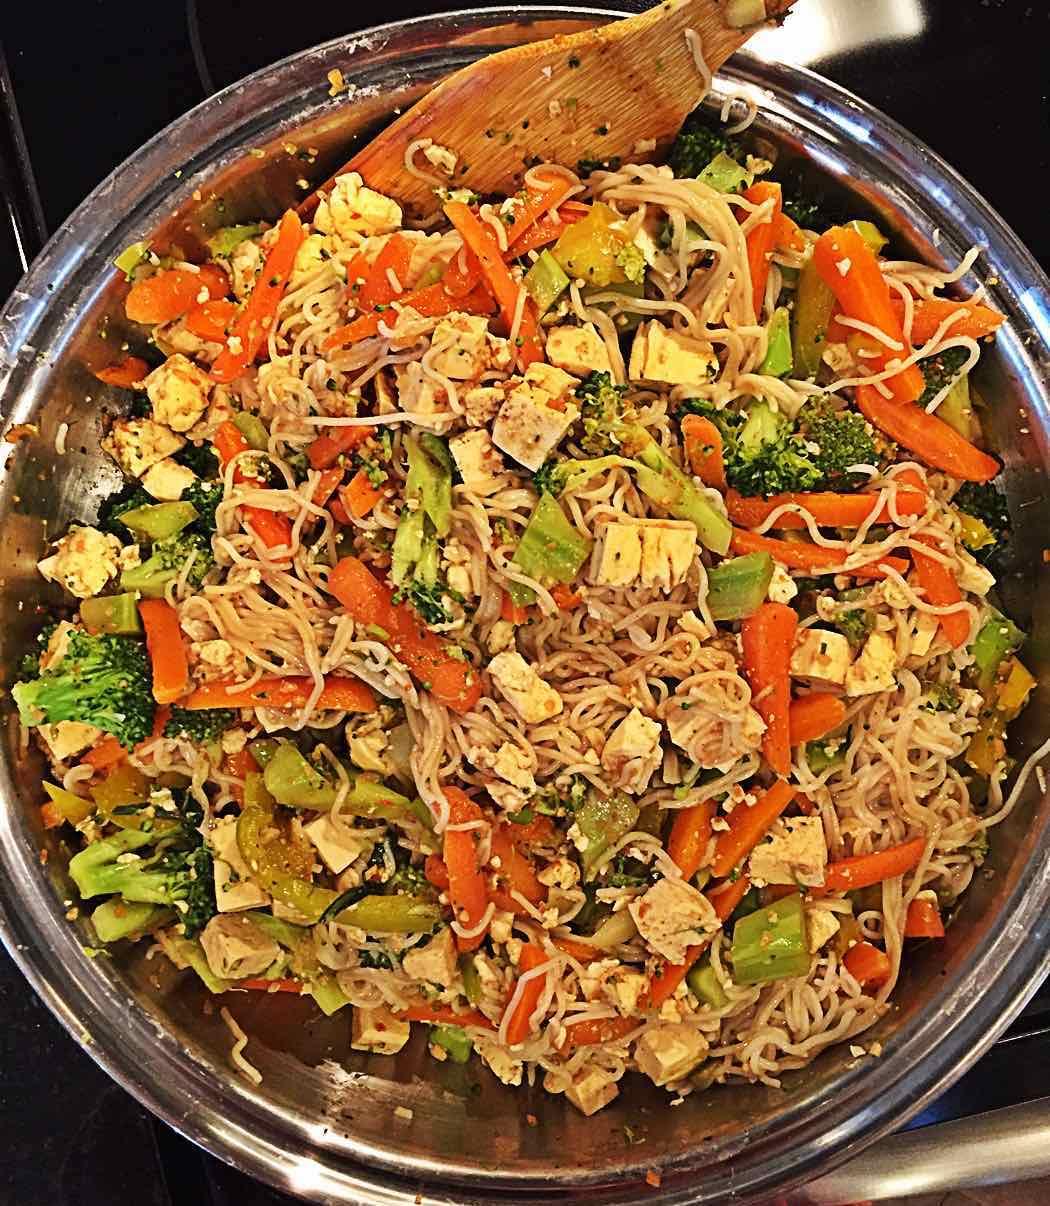 Whole foods no oil brown rice noodles Vegan Pad Thai in Wok